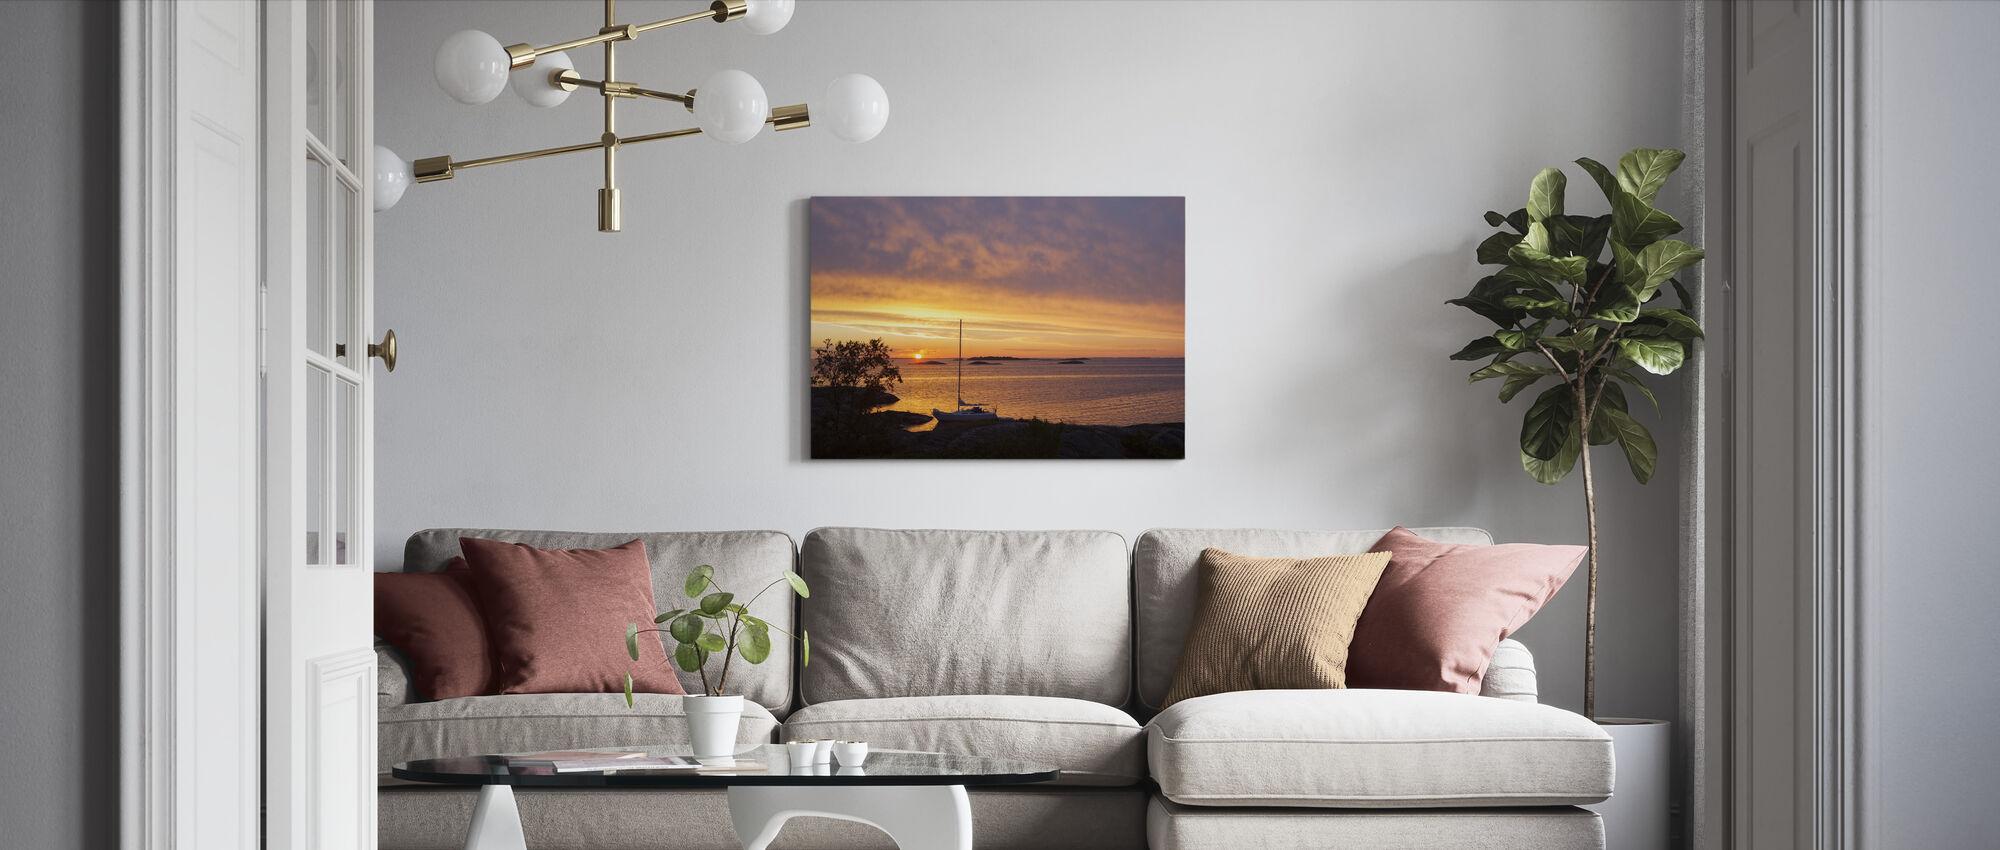 Stockholm Archipelago Scenics - Canvas print - Living Room